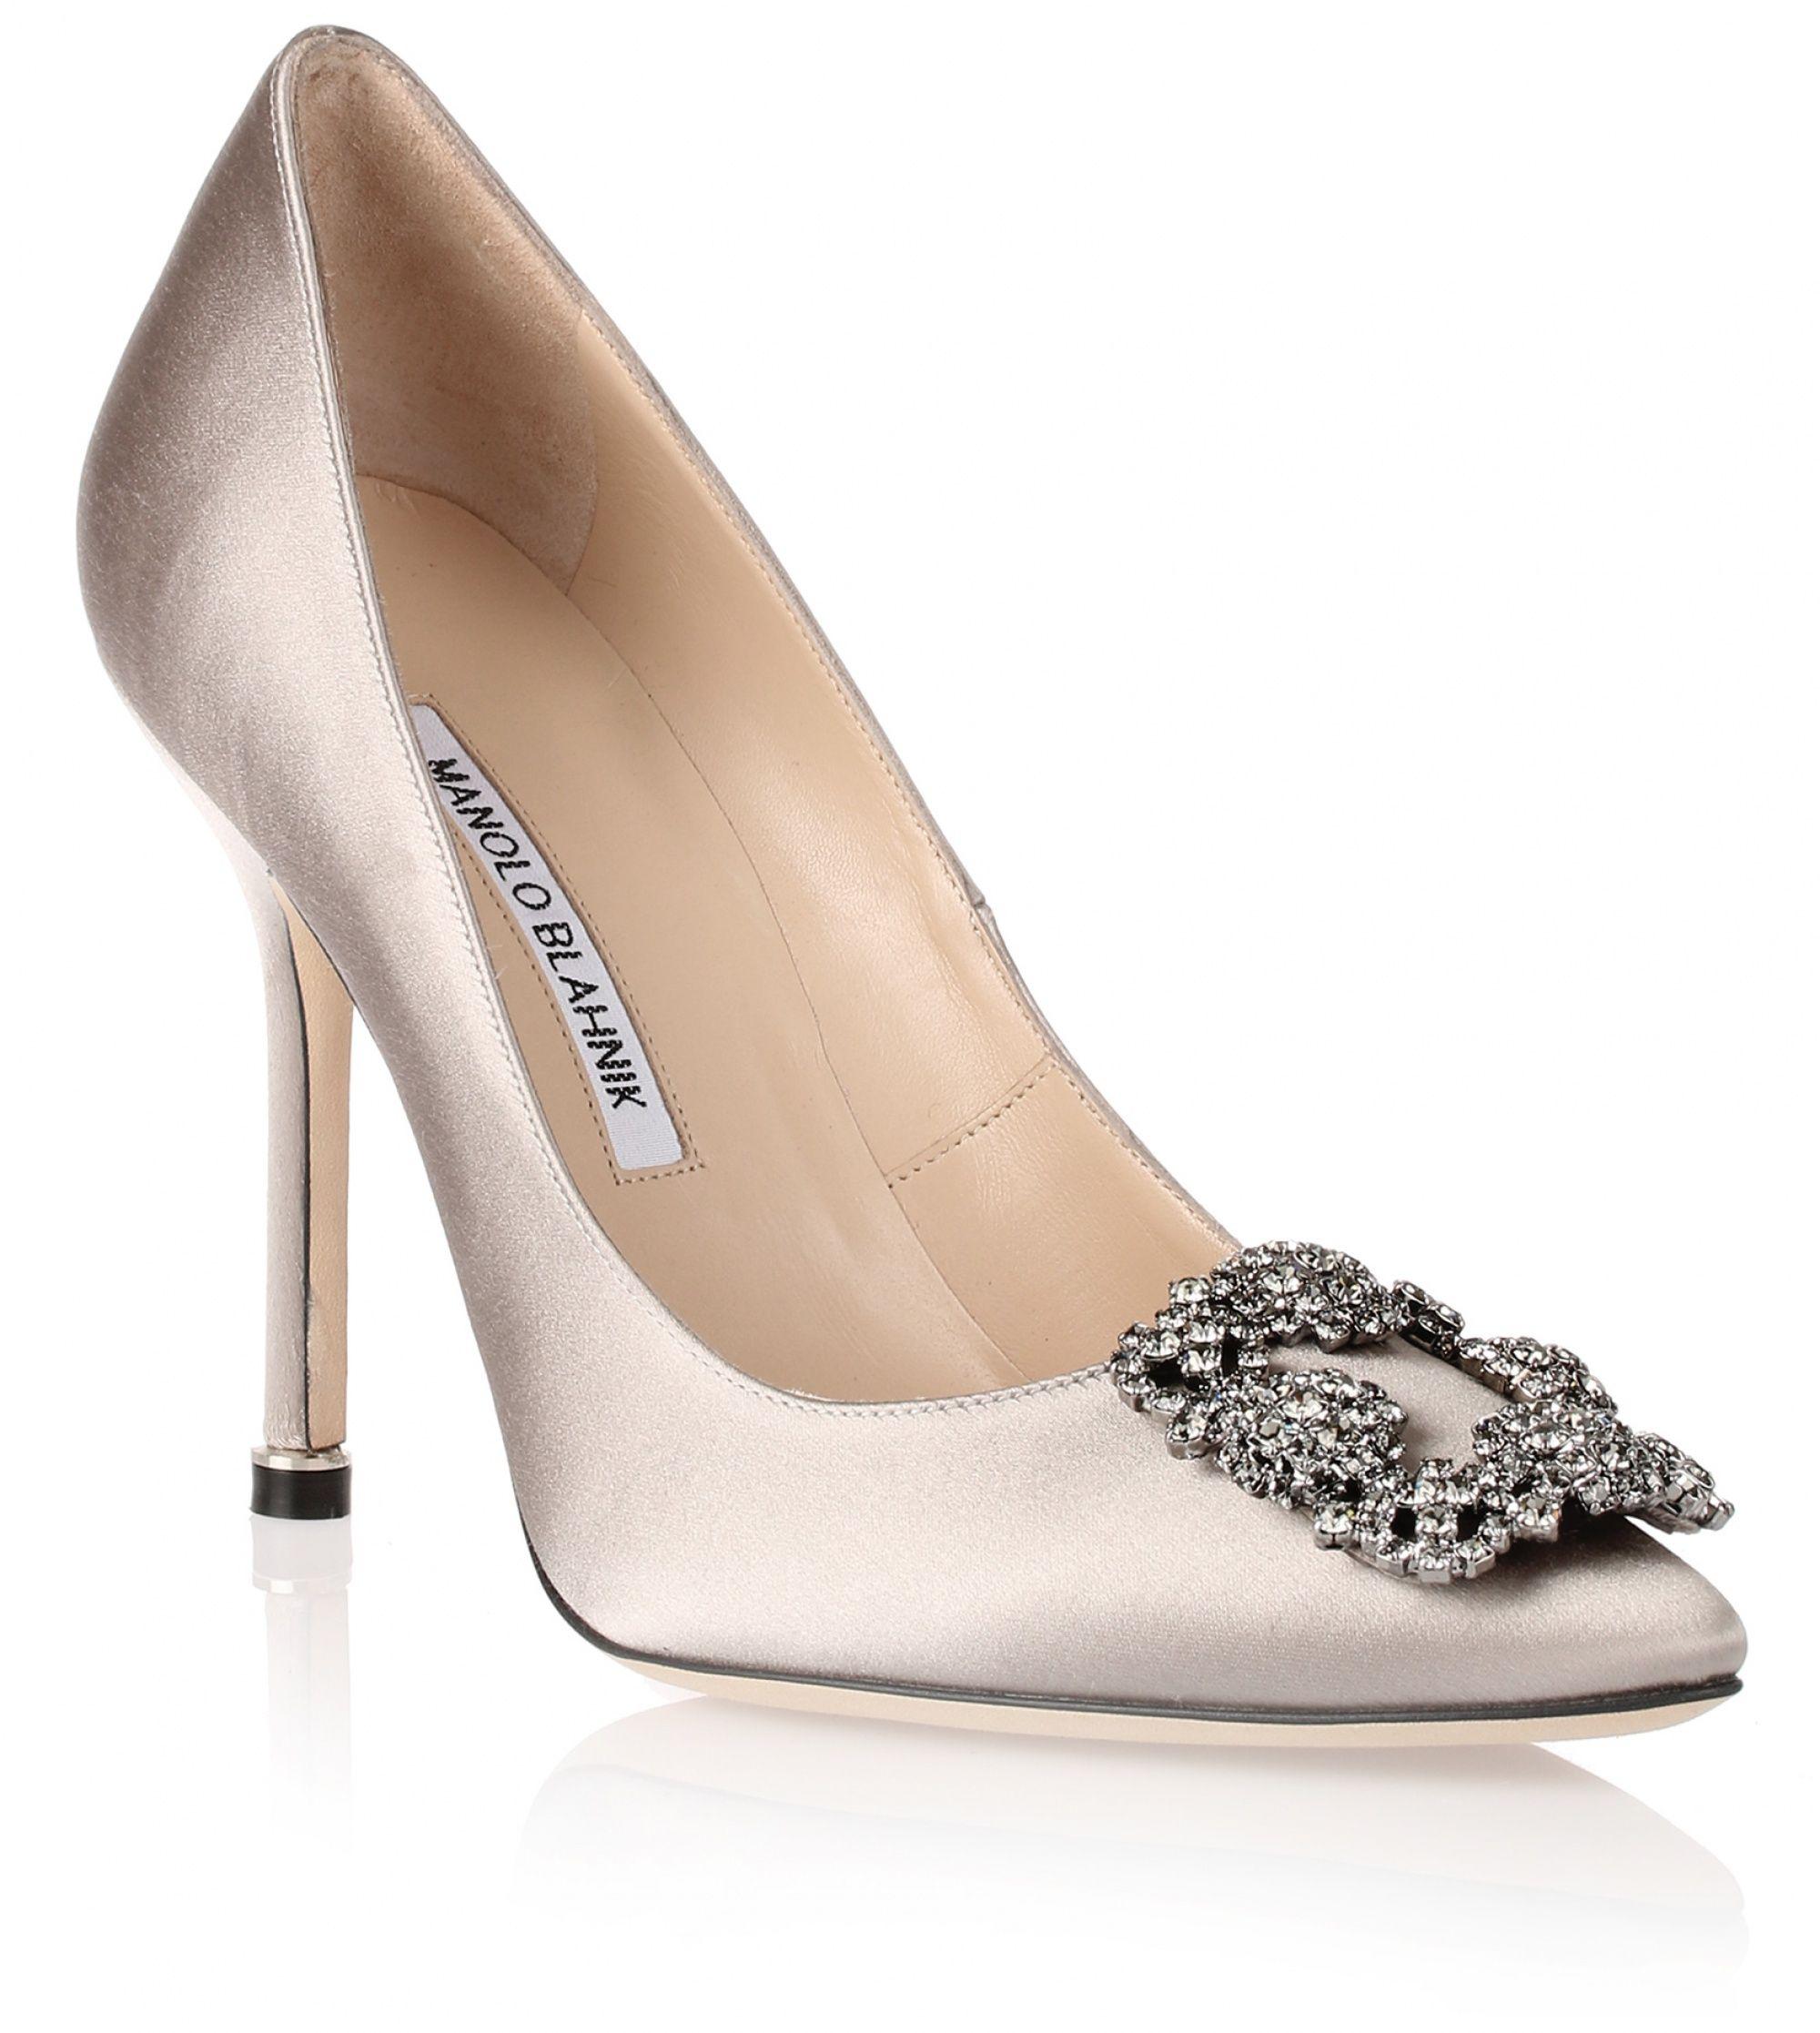 ccf93723c Hangisi 105 silver grey satin pumps | Heels | Manolo blahnik hangisi ...